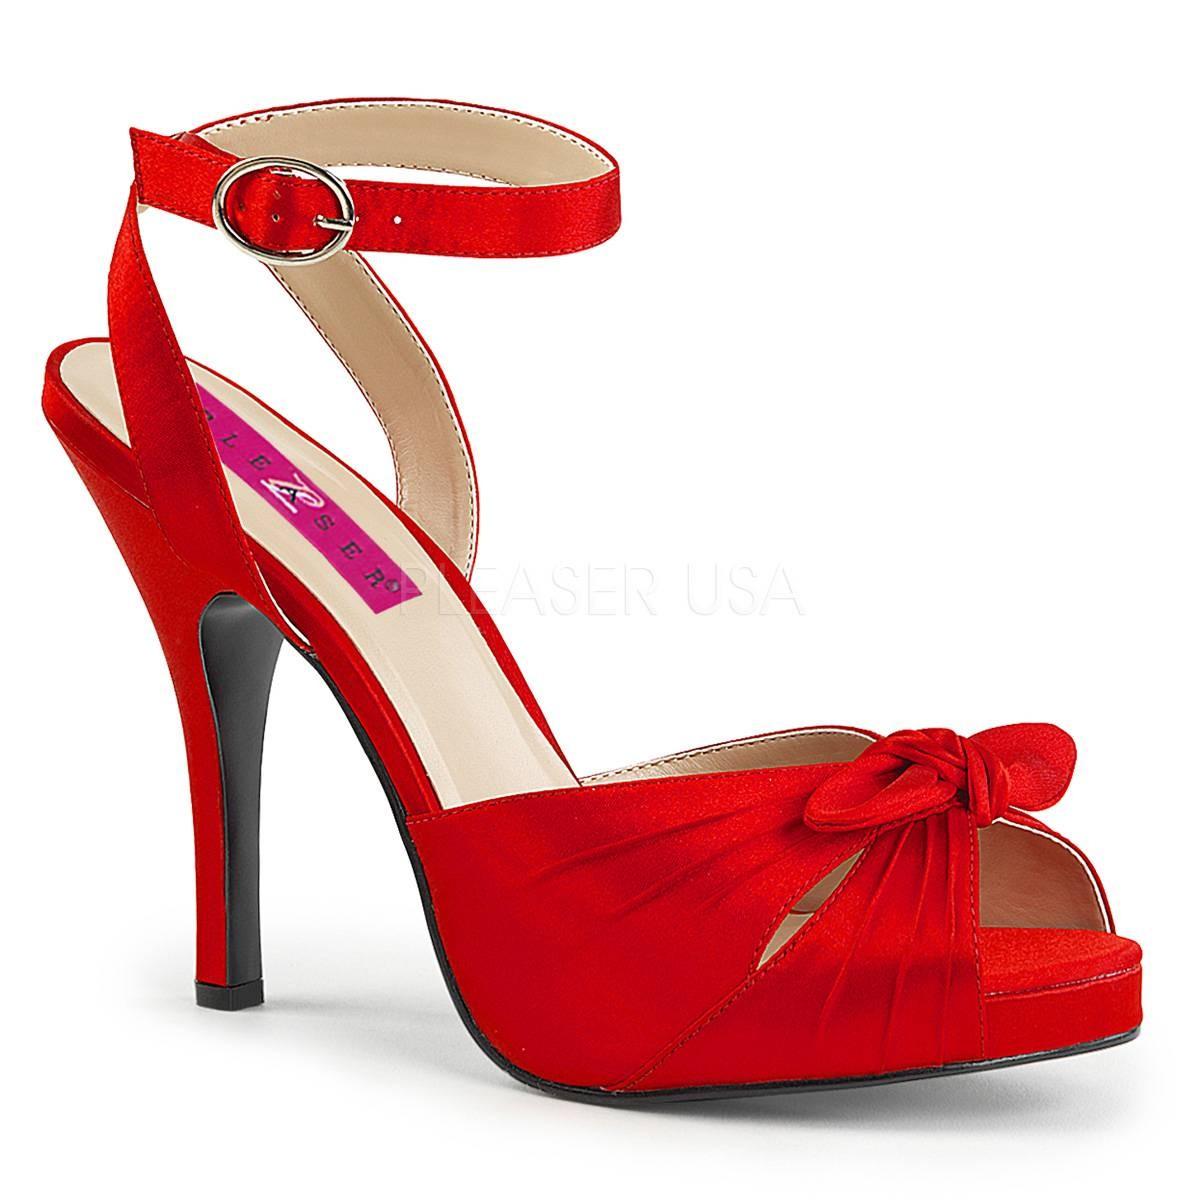 Sandalen - EVE 01 ° Damen Sandalette ° RotSatin ° Pleaser Pink Label  - Onlineshop RedSixty